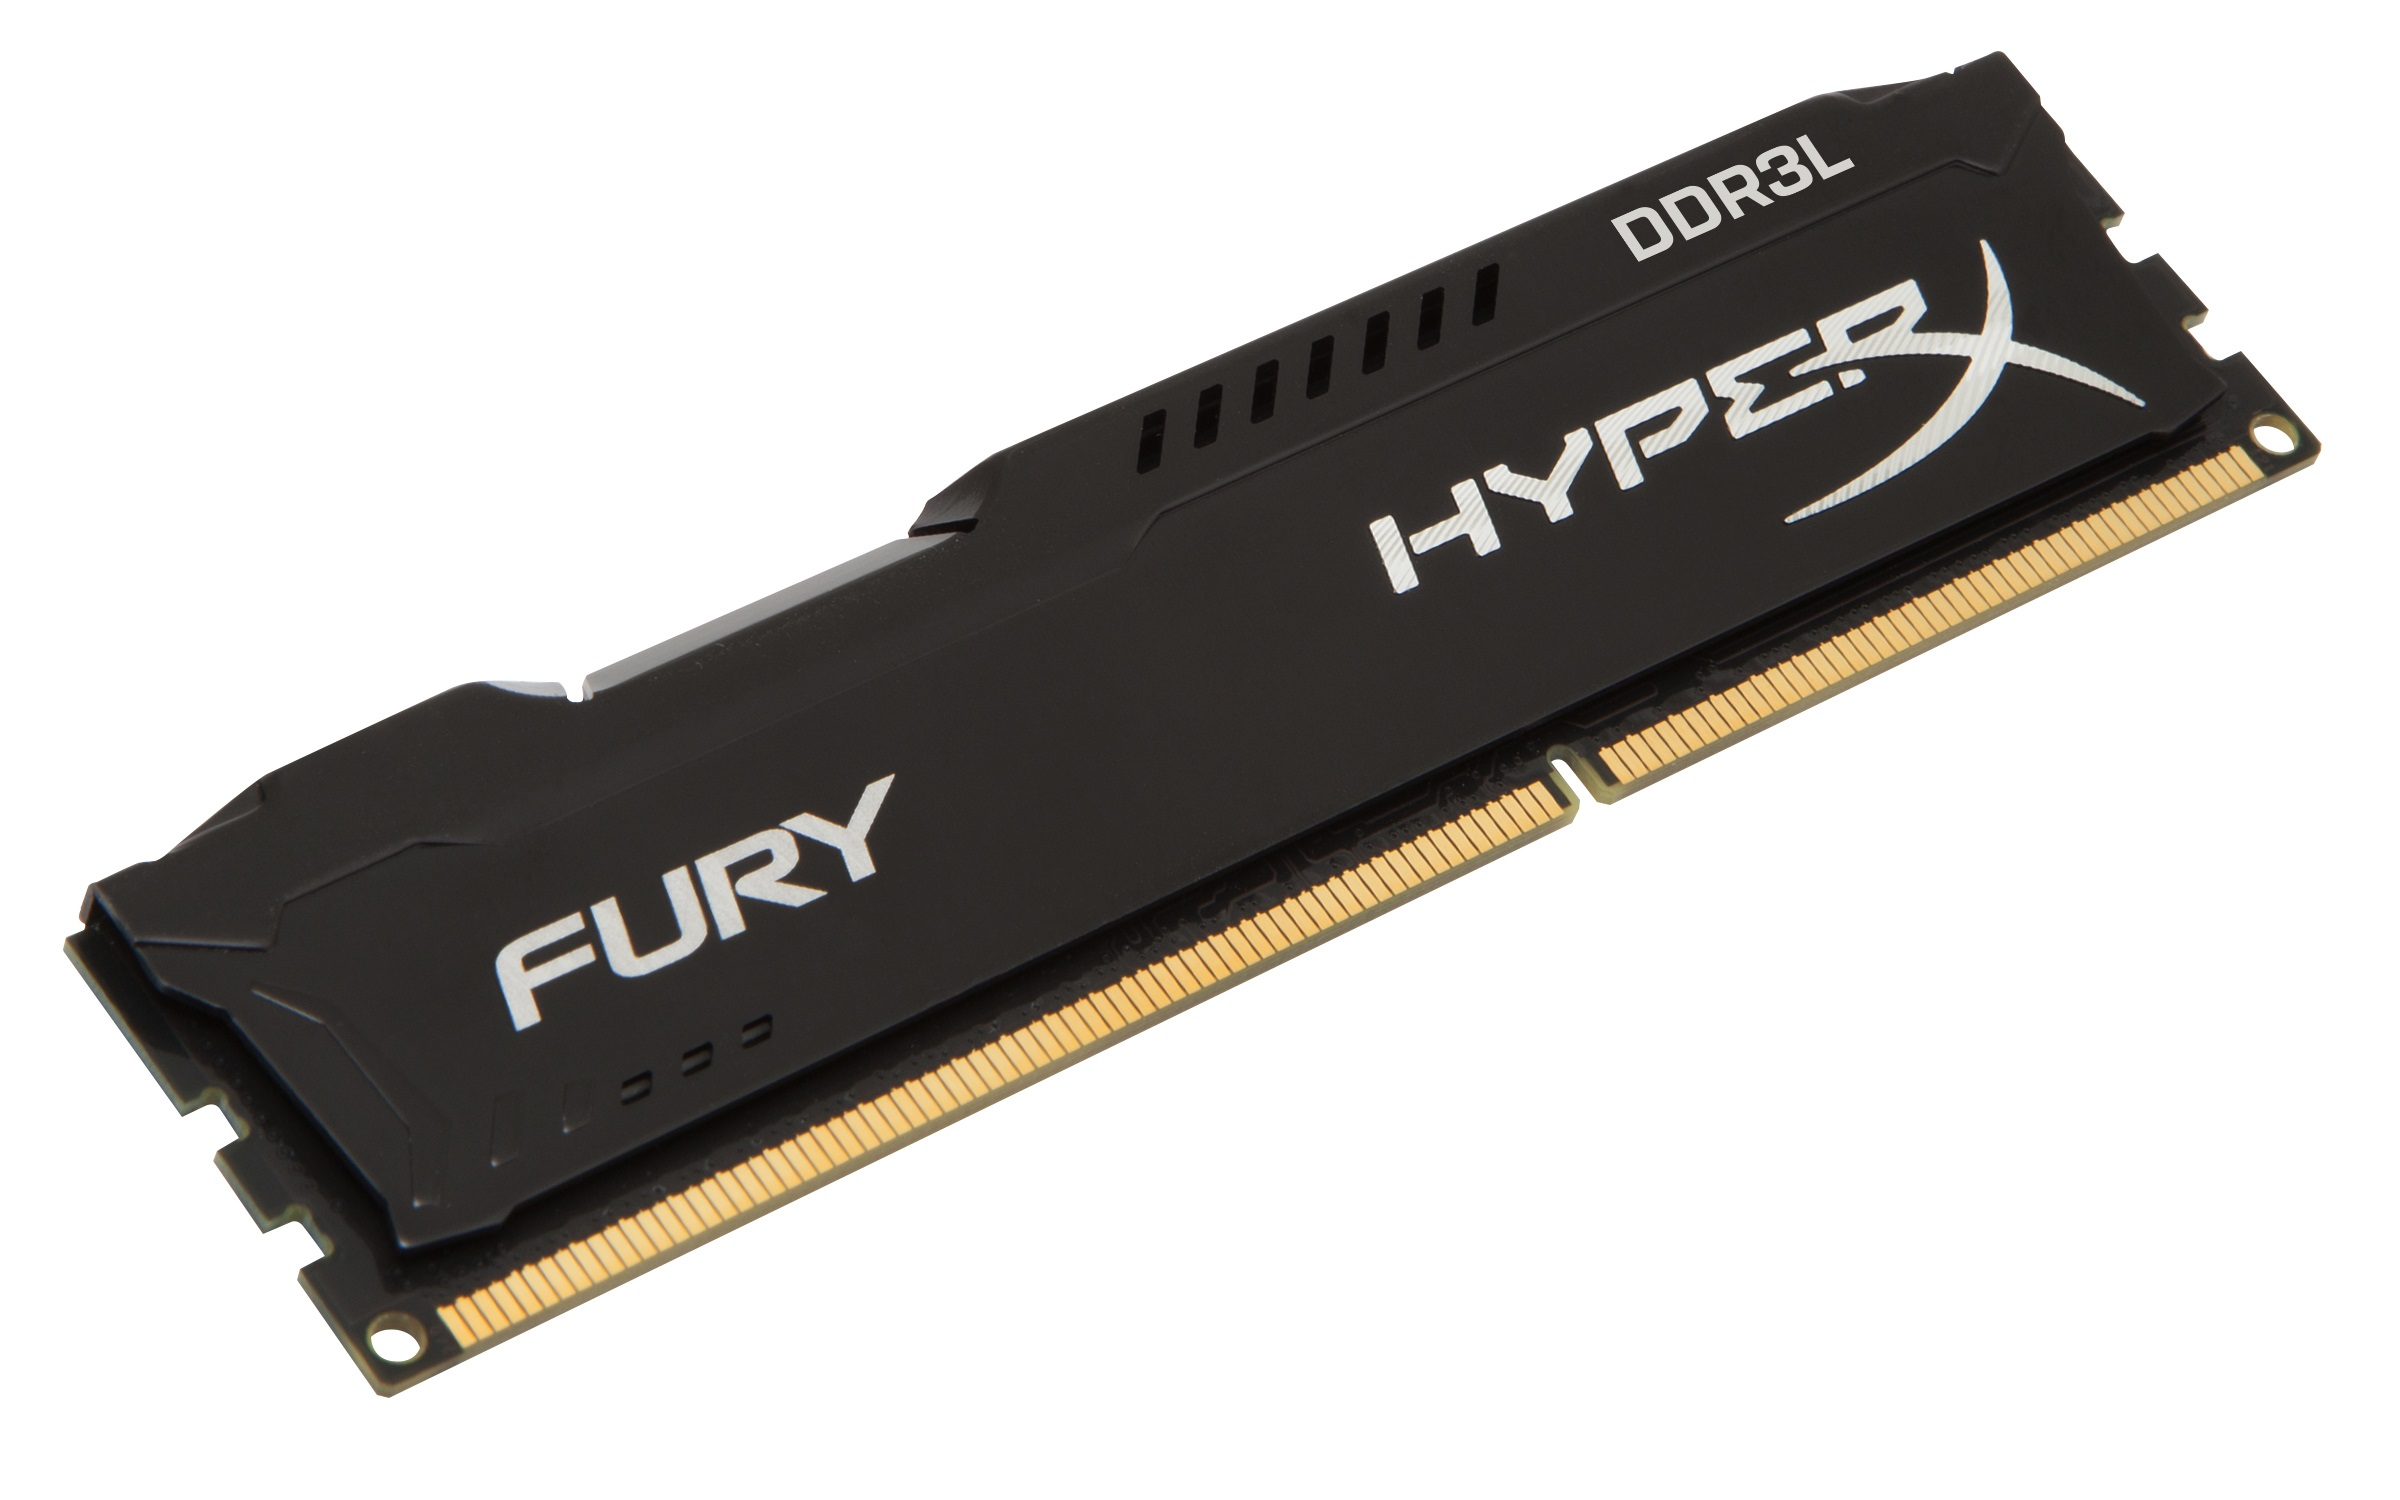 8GB DDR3L-1866MHz Kingston HyperX Fury Black